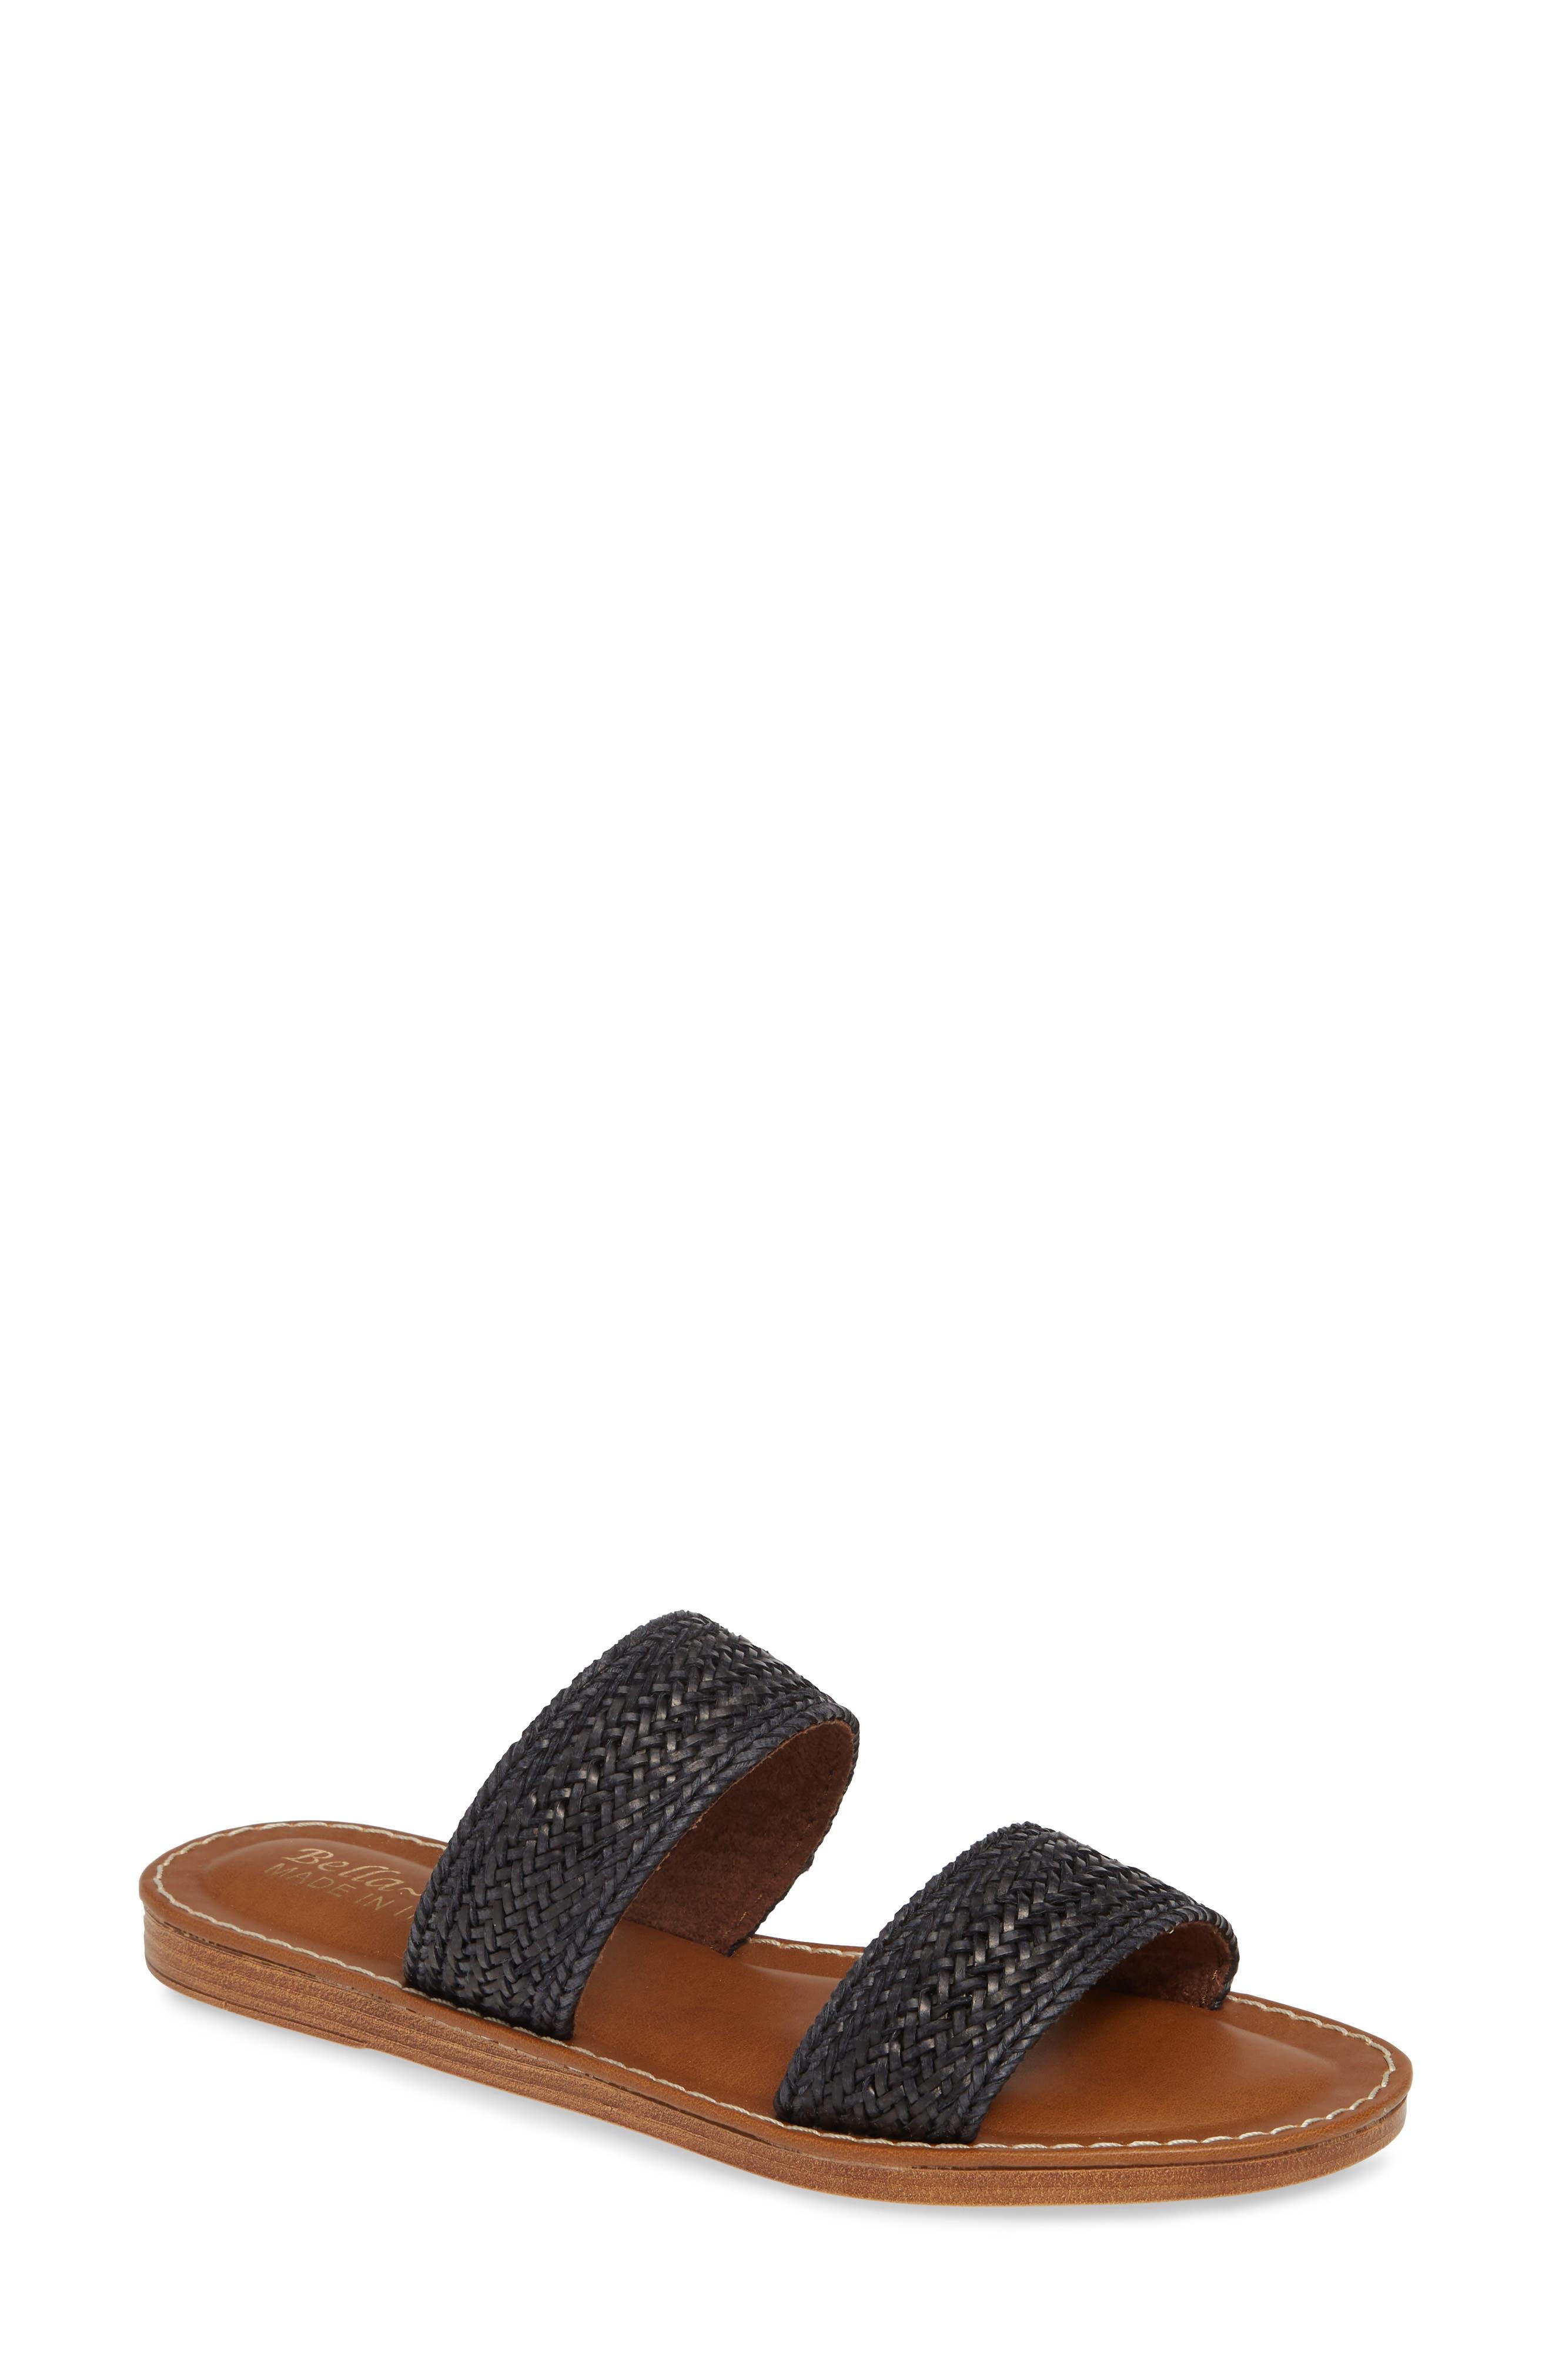 BELLA VITA, Two-Strap Slide Sandal, Main thumbnail 1, color, BLACK WOVEN